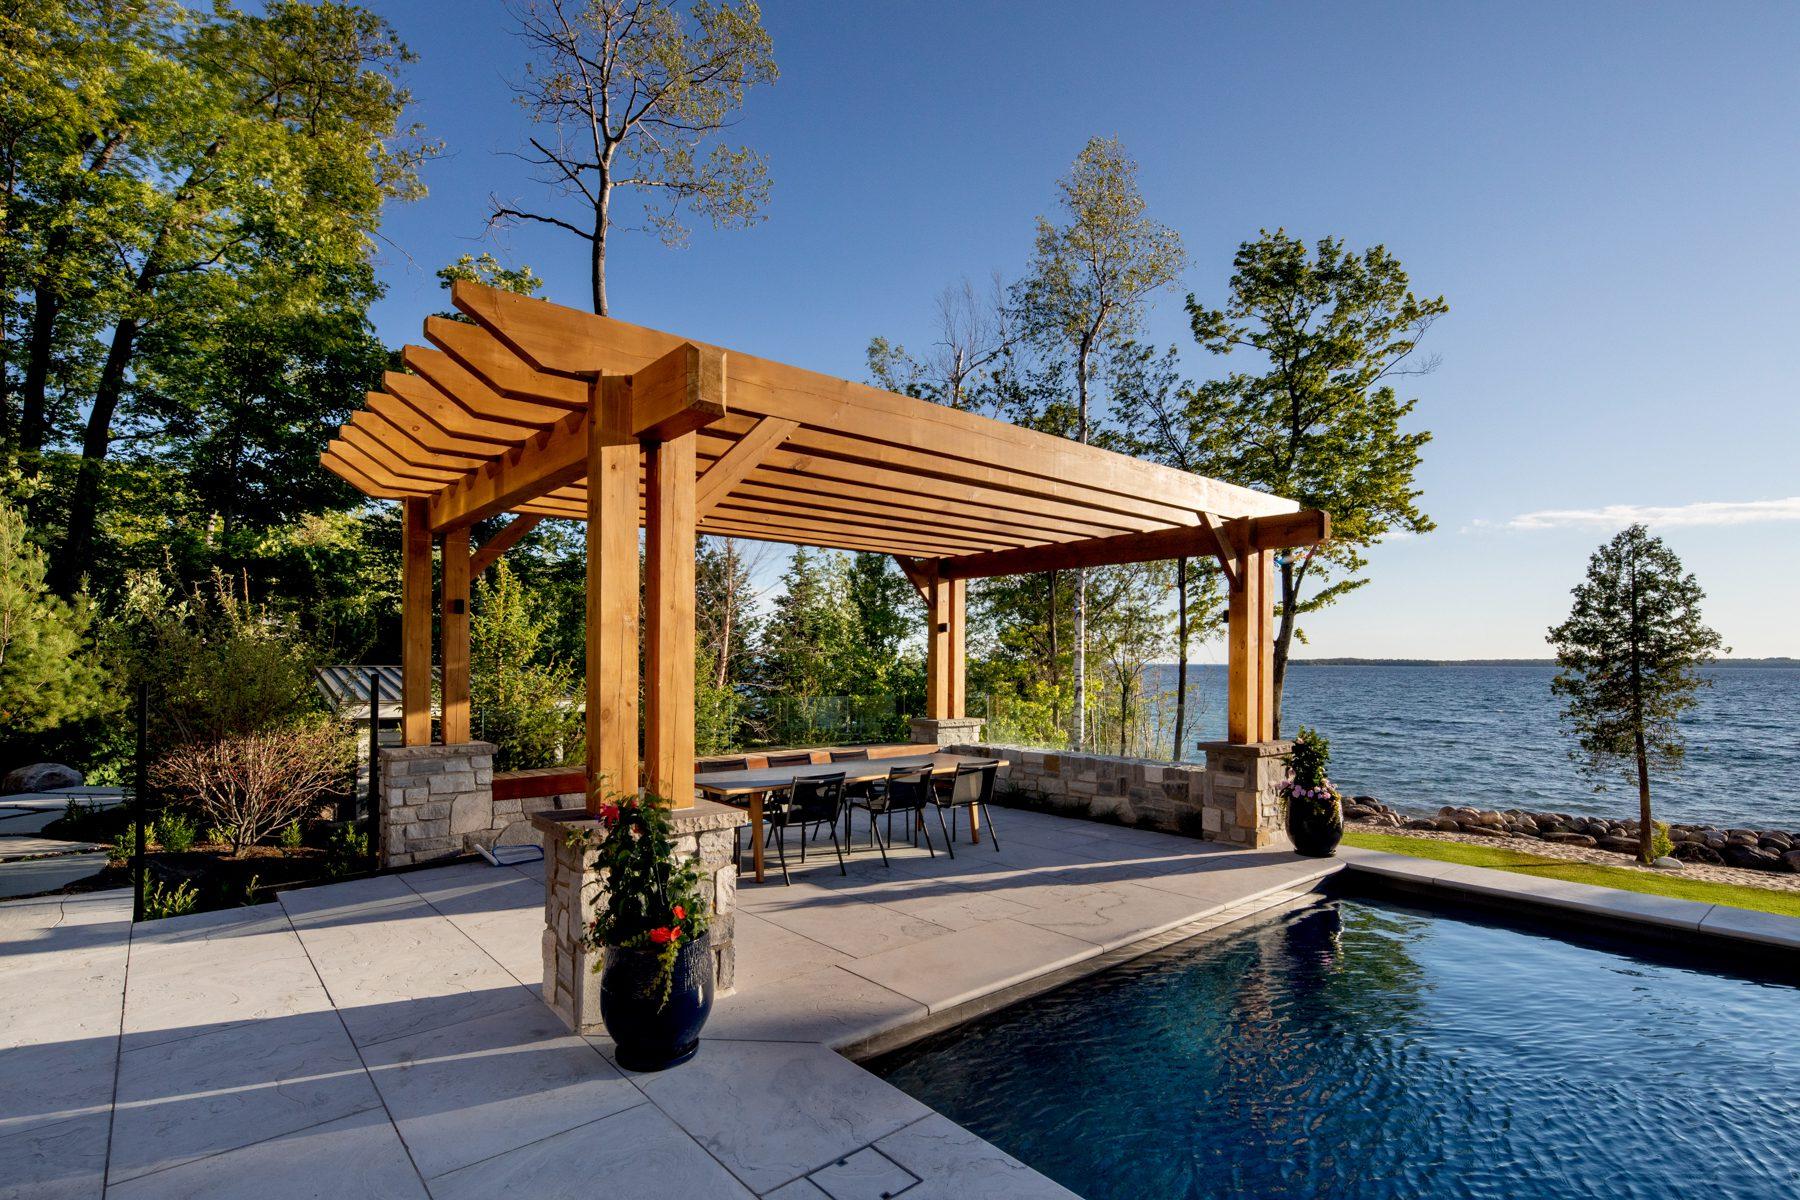 Normerica-Timber-Homes-Timber-Frame-Portfolio-Beachside-Bliss-Exterior-Pool-Timber-Pergola-Outdoor-Dining-Outdoor-Entertaining